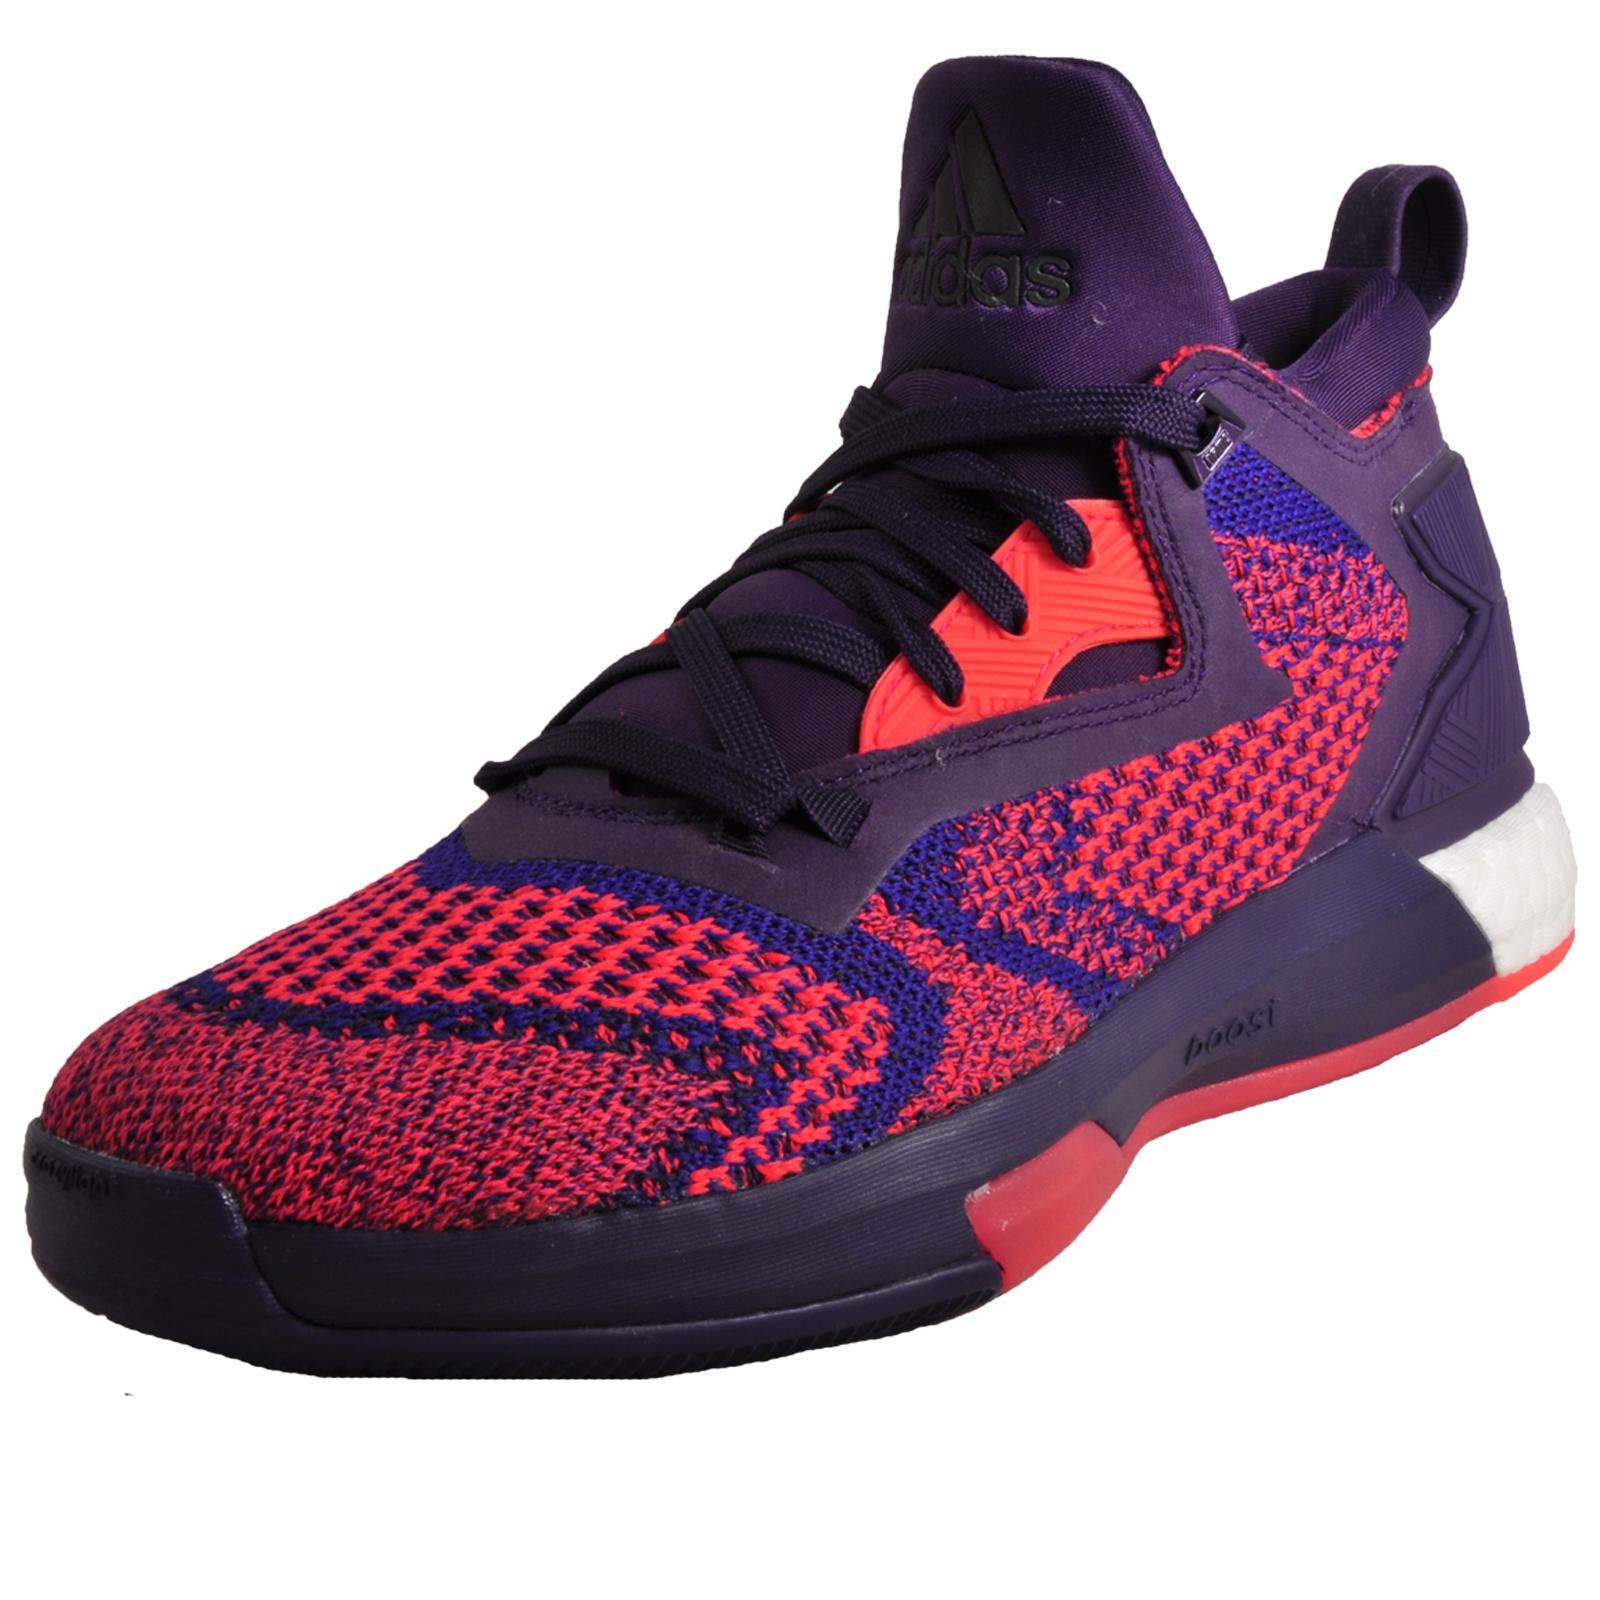 huge selection of 2c505 9263e ... reduced adidas damian lillard 2 boost primeknit mens basketball  trainers purple ltd edition 6fd94 8d491